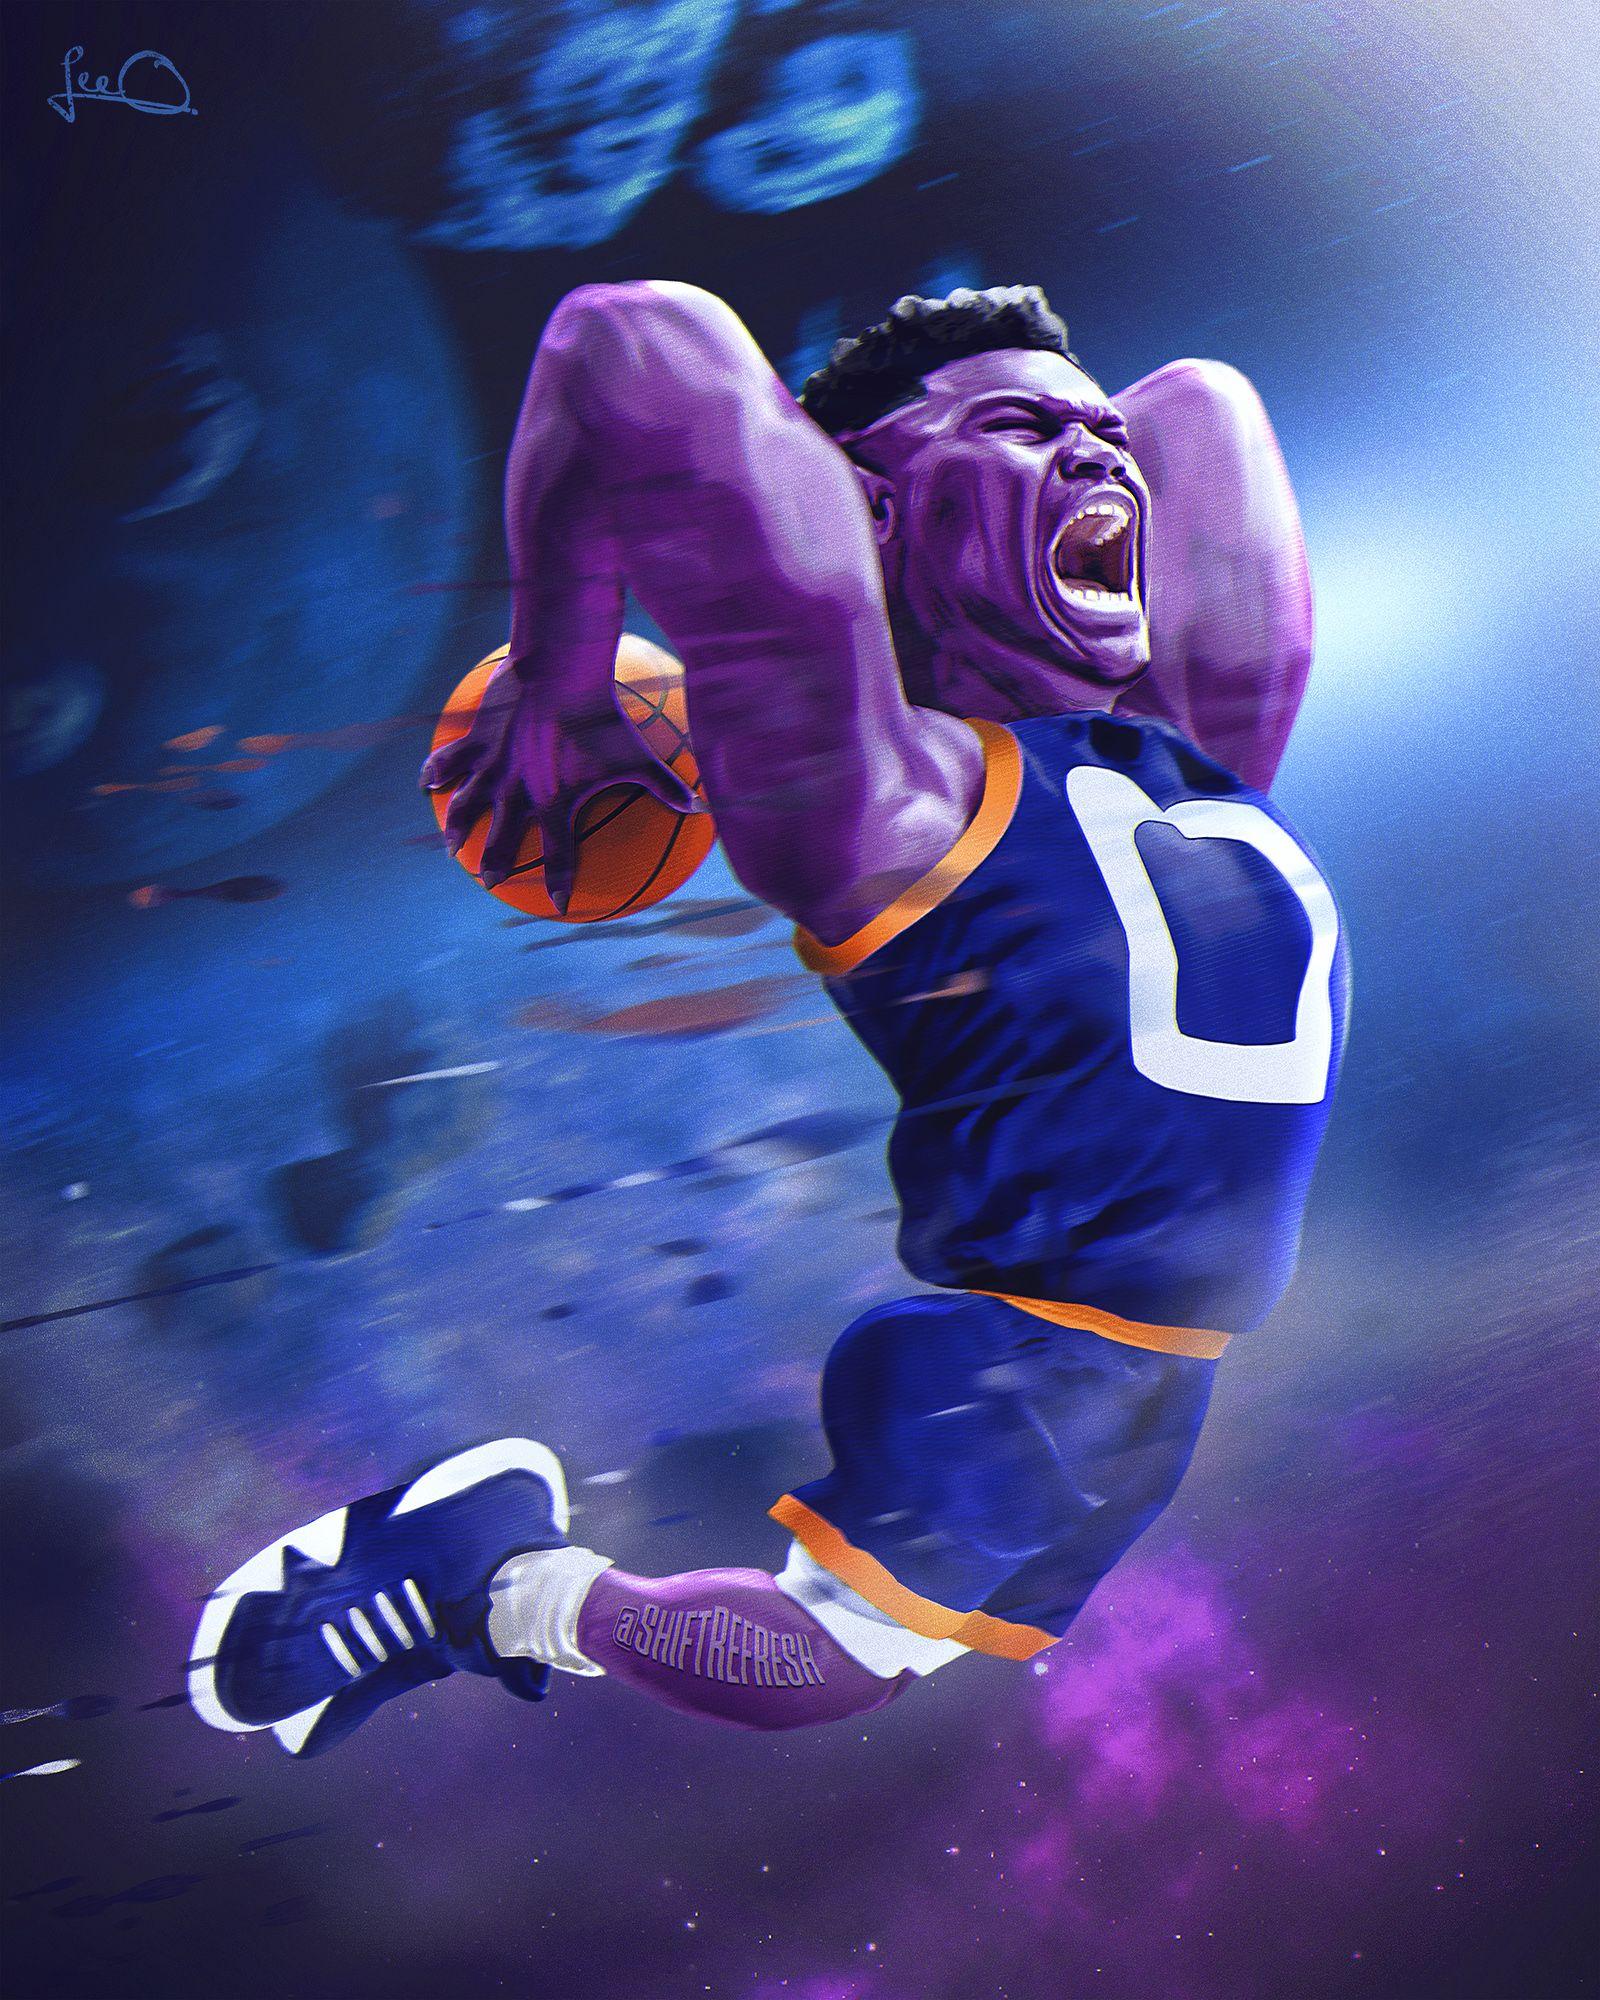 Zion Williamson Is A Monstar Shiftrefresh Basketball Players Nba Nba Basketball Art Mvp Basketball